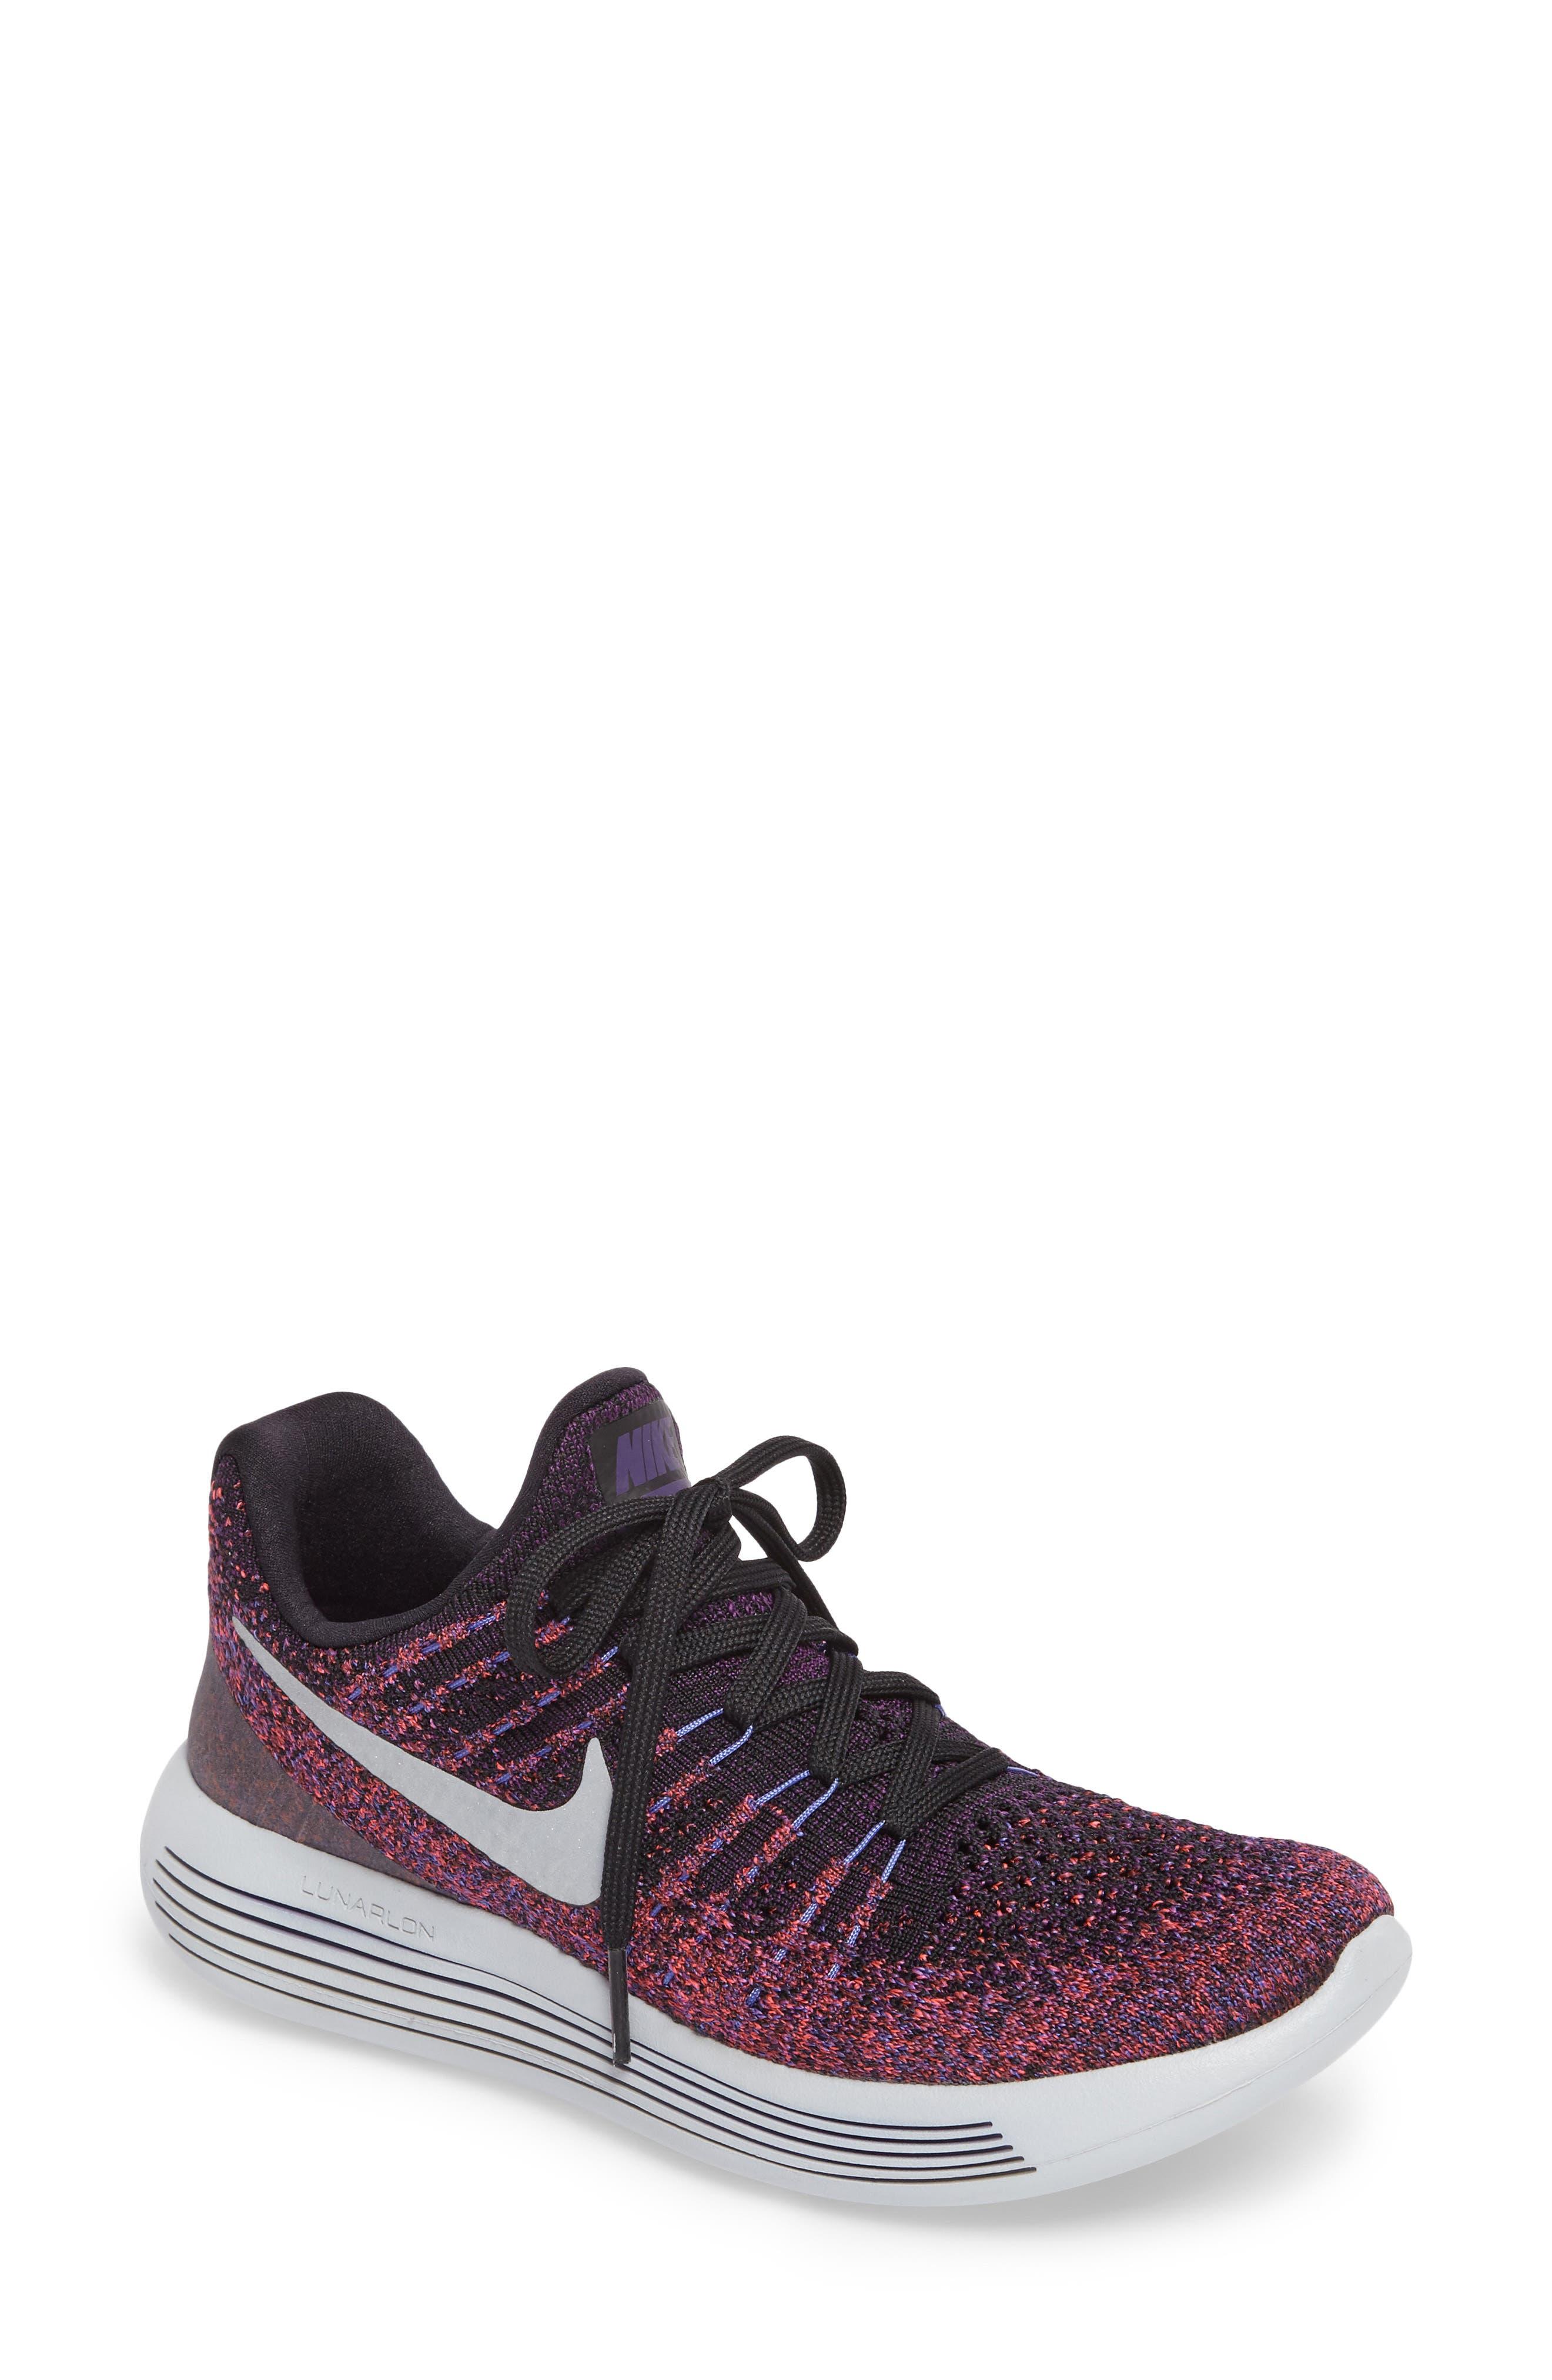 LunarEpic Low Flyknit 2 Running Shoe,                             Main thumbnail 6, color,